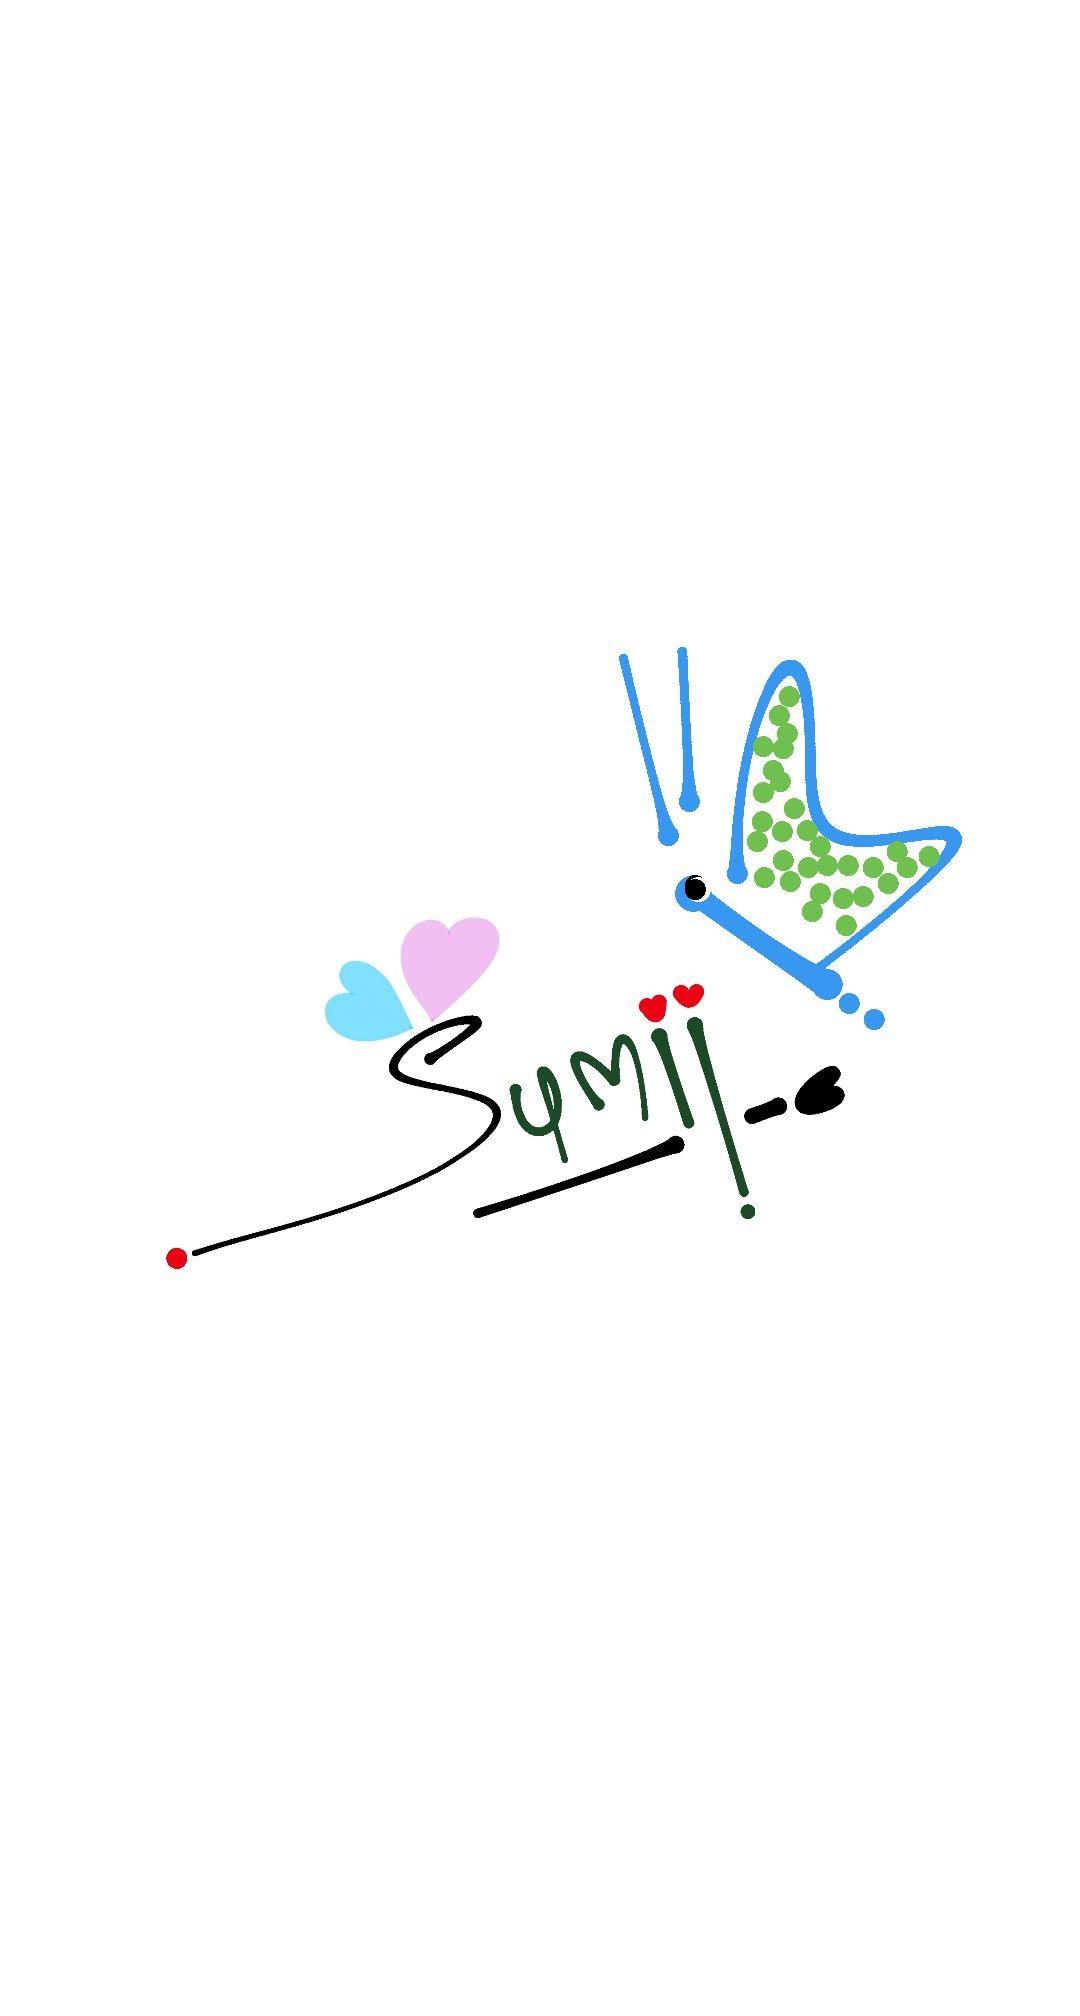 Pin by Umesh soni on NAME ART Name art, Art, Drawings